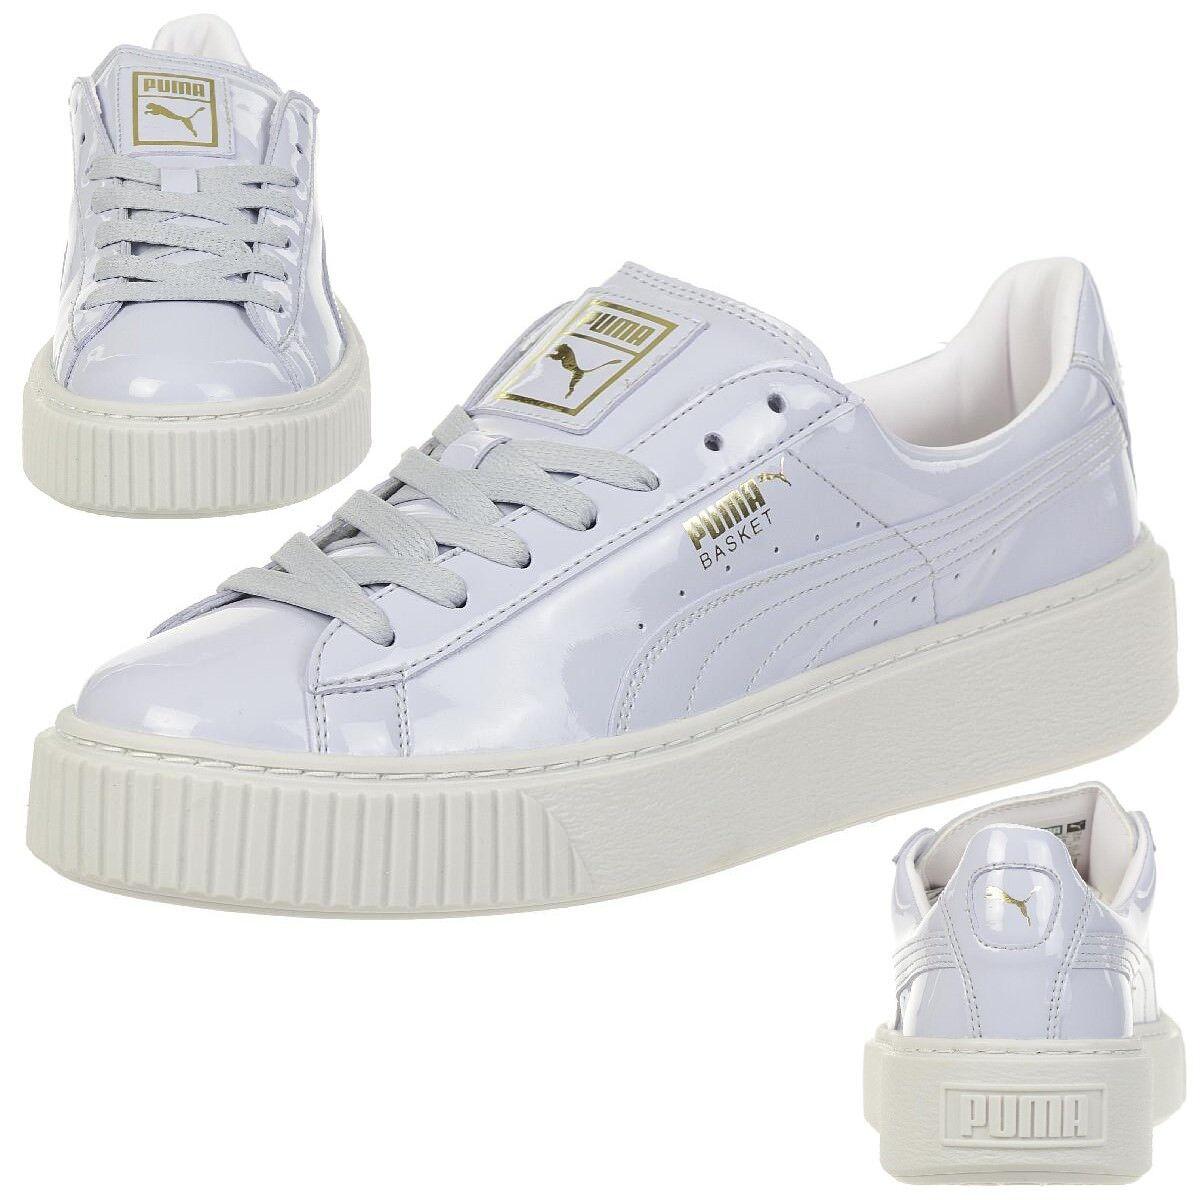 Puma Basket Platform Patent Sneaker Women's Girls' shoes 363314 01